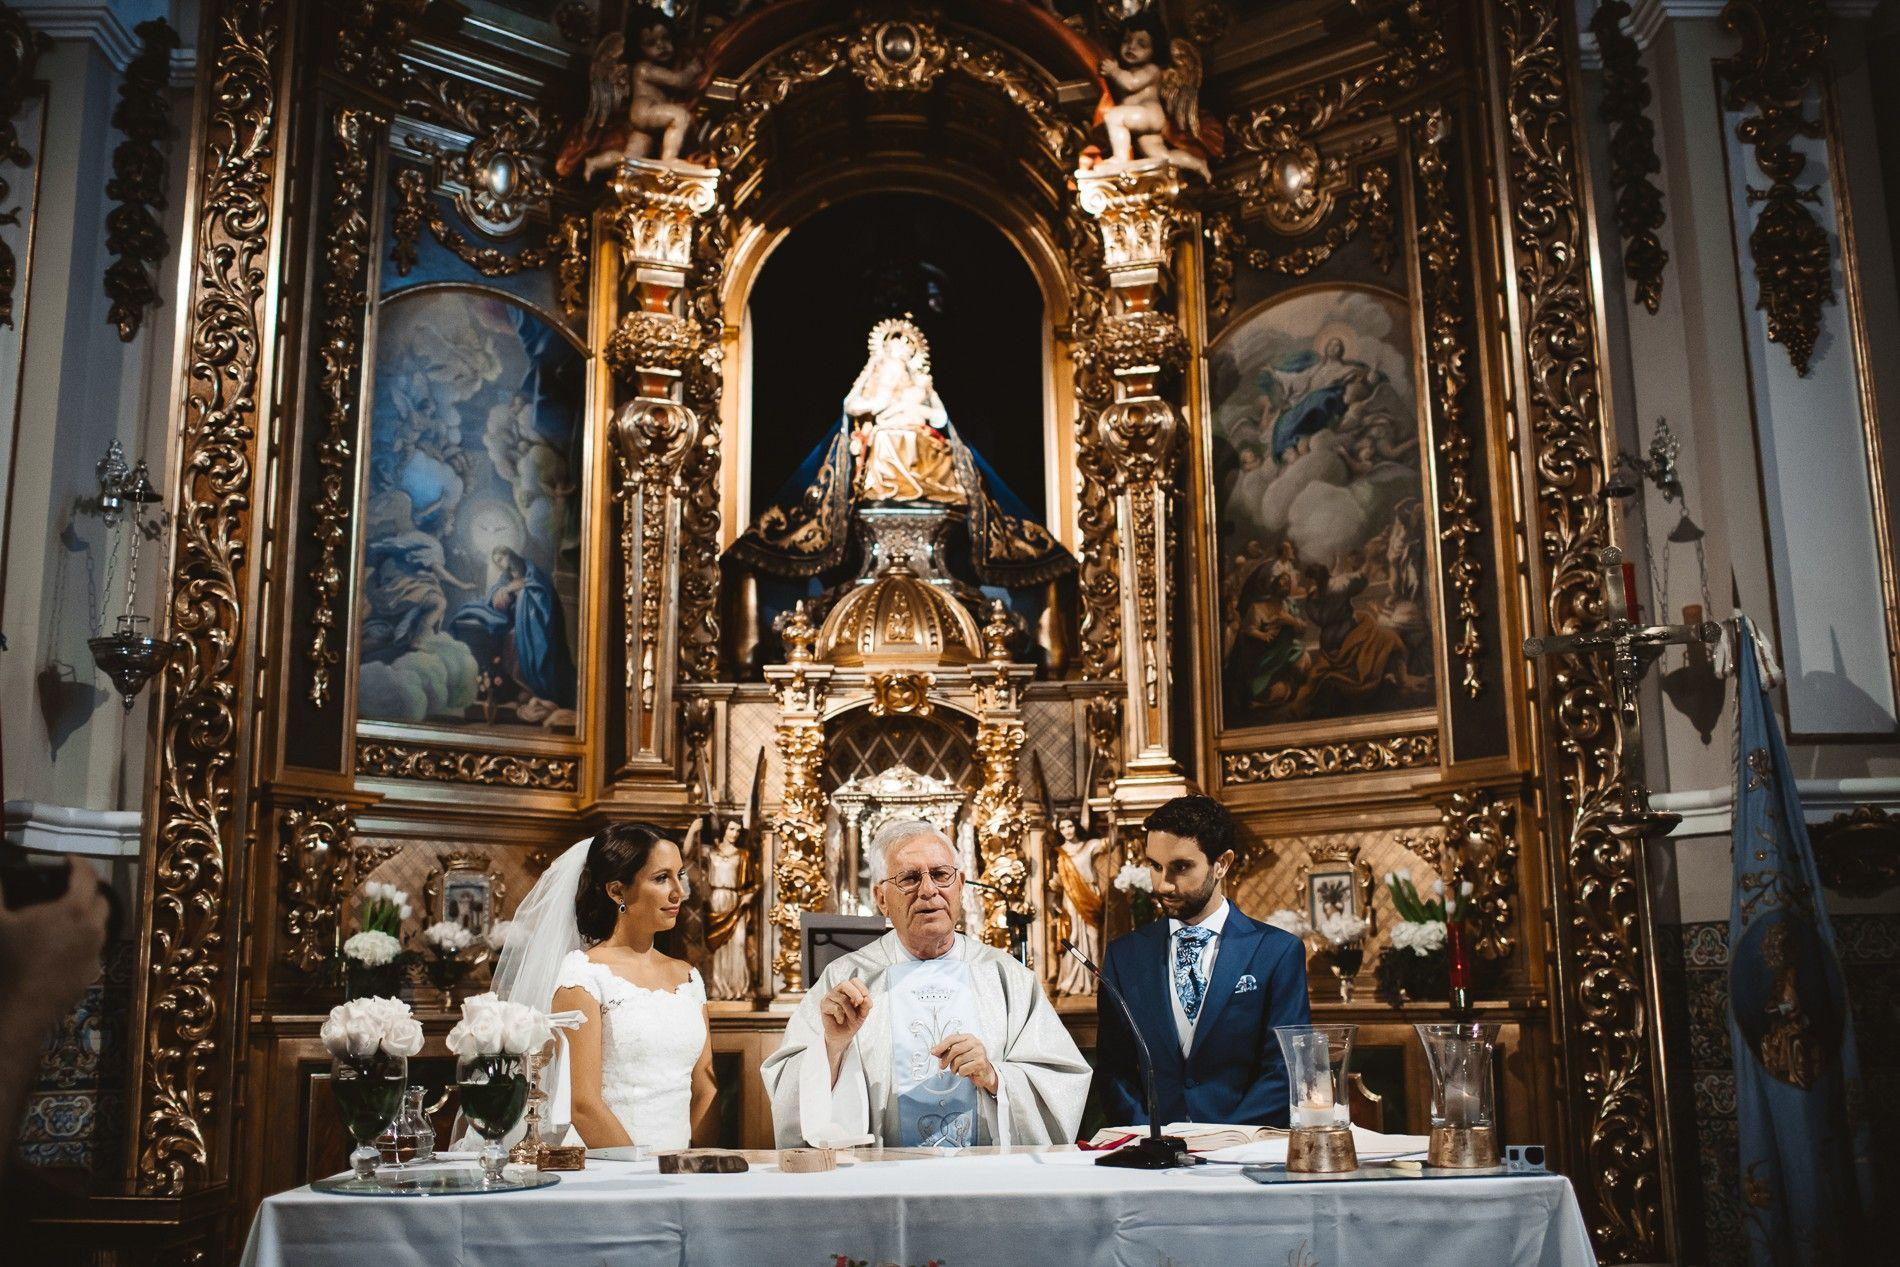 fotografo-de-boda-plasencia-19